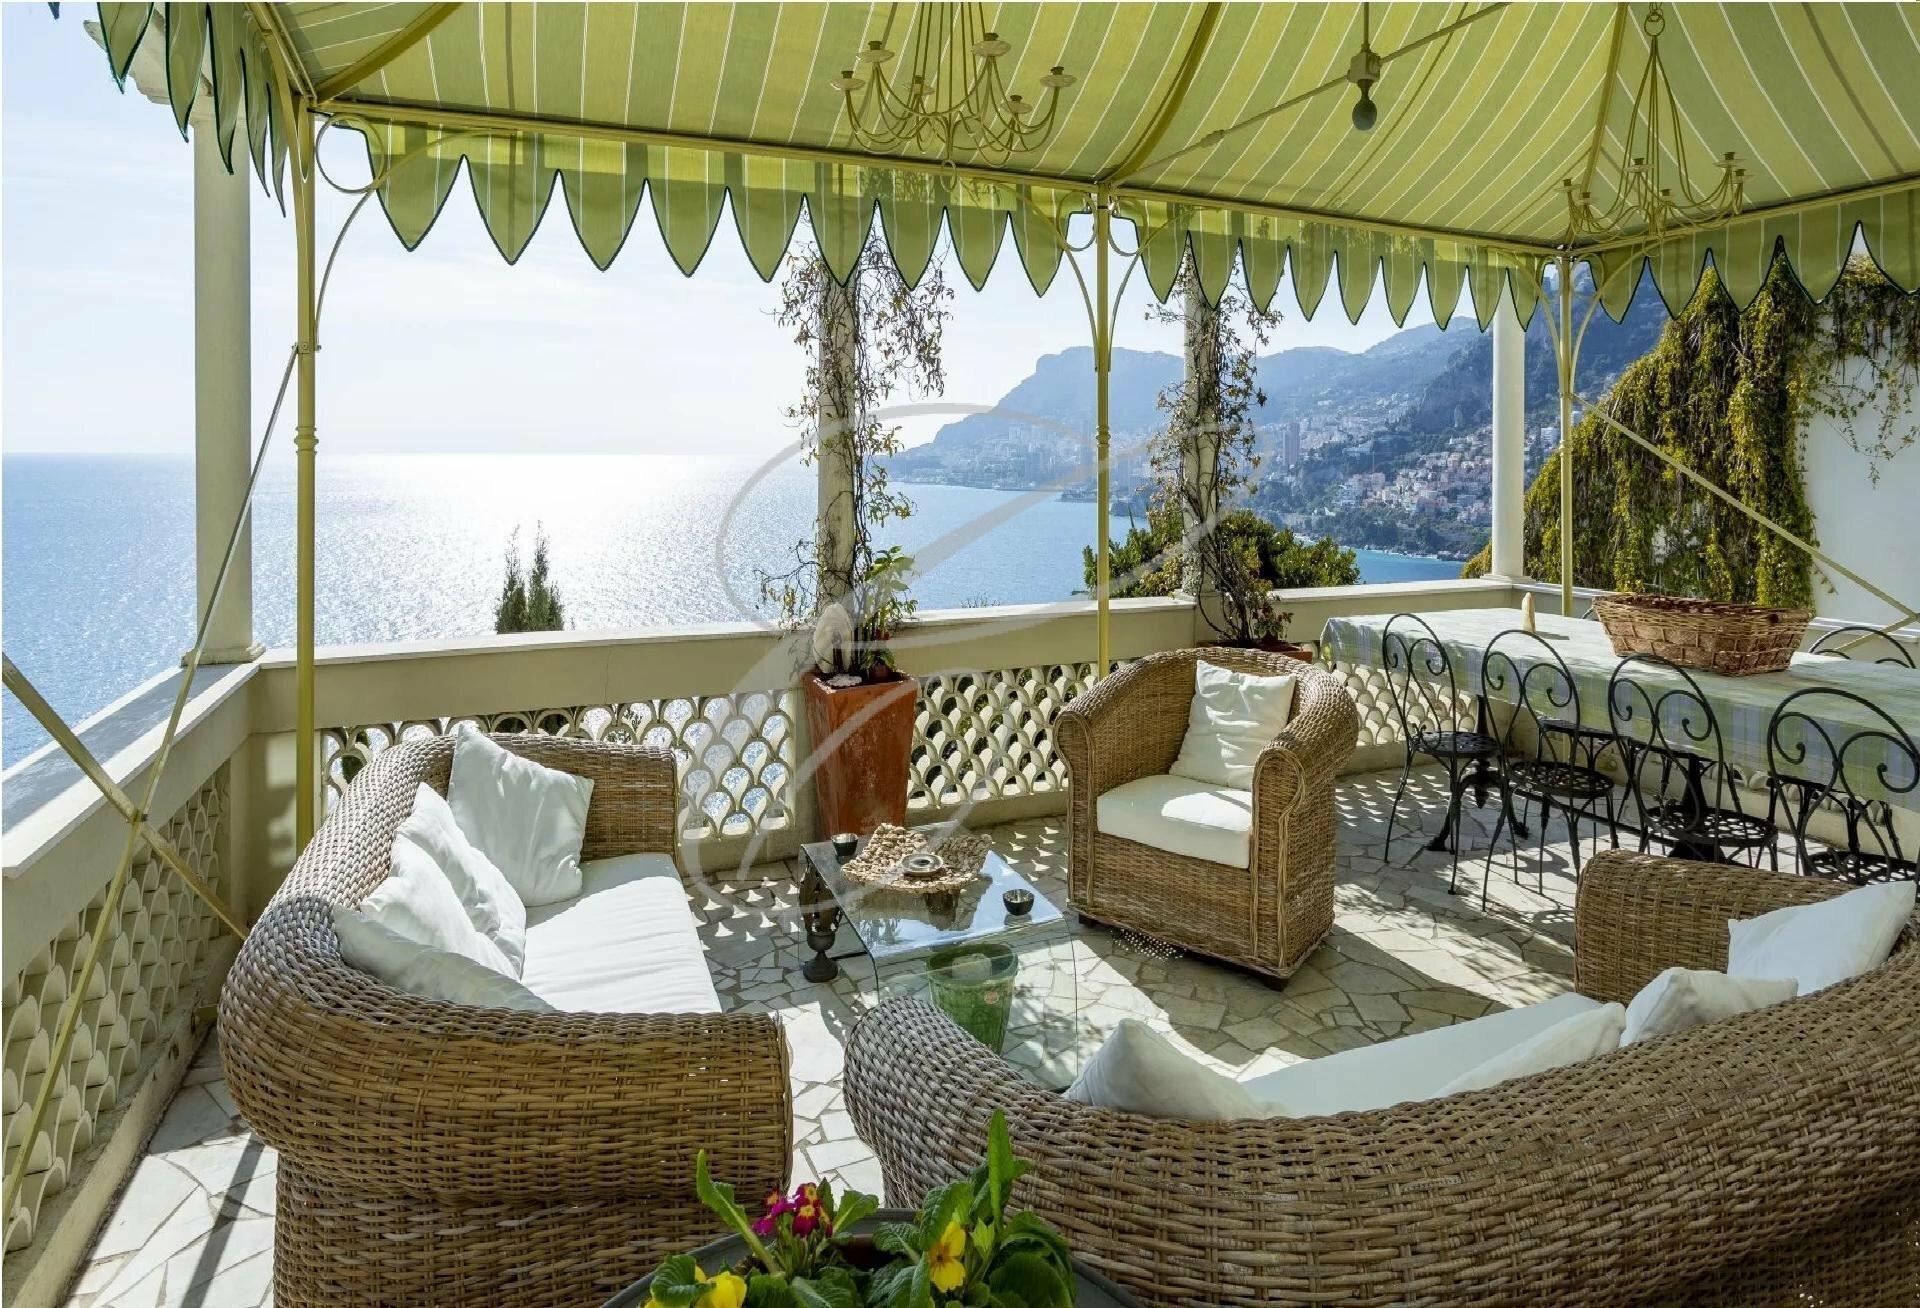 Villa in Roquebrune-Cap-Martin, Provence-Alpes-Côte d'Azur, France 1 - 10966432